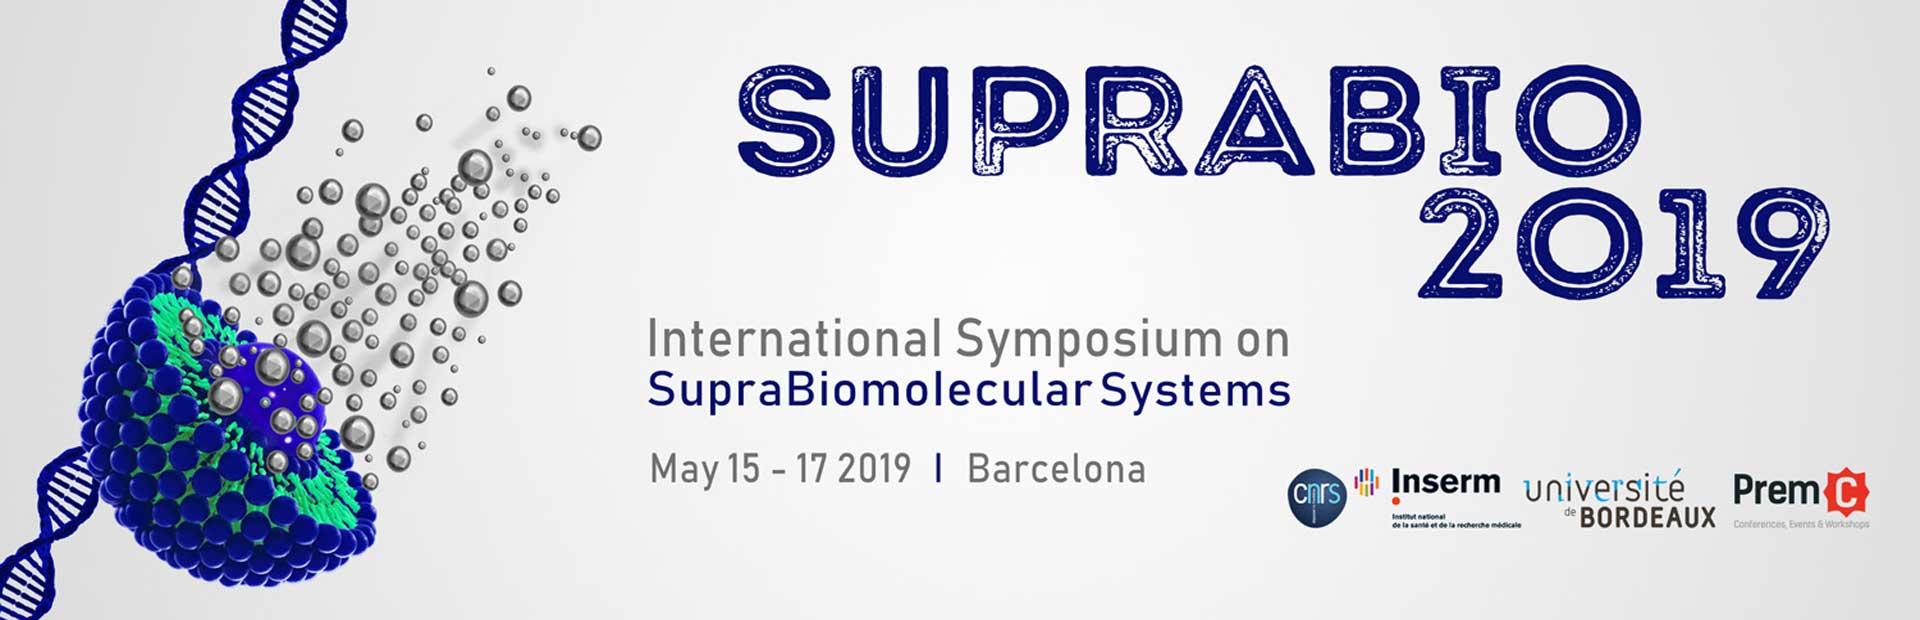 International Symposium on Suprabiomolecular Systems - SUPRABIO 2019